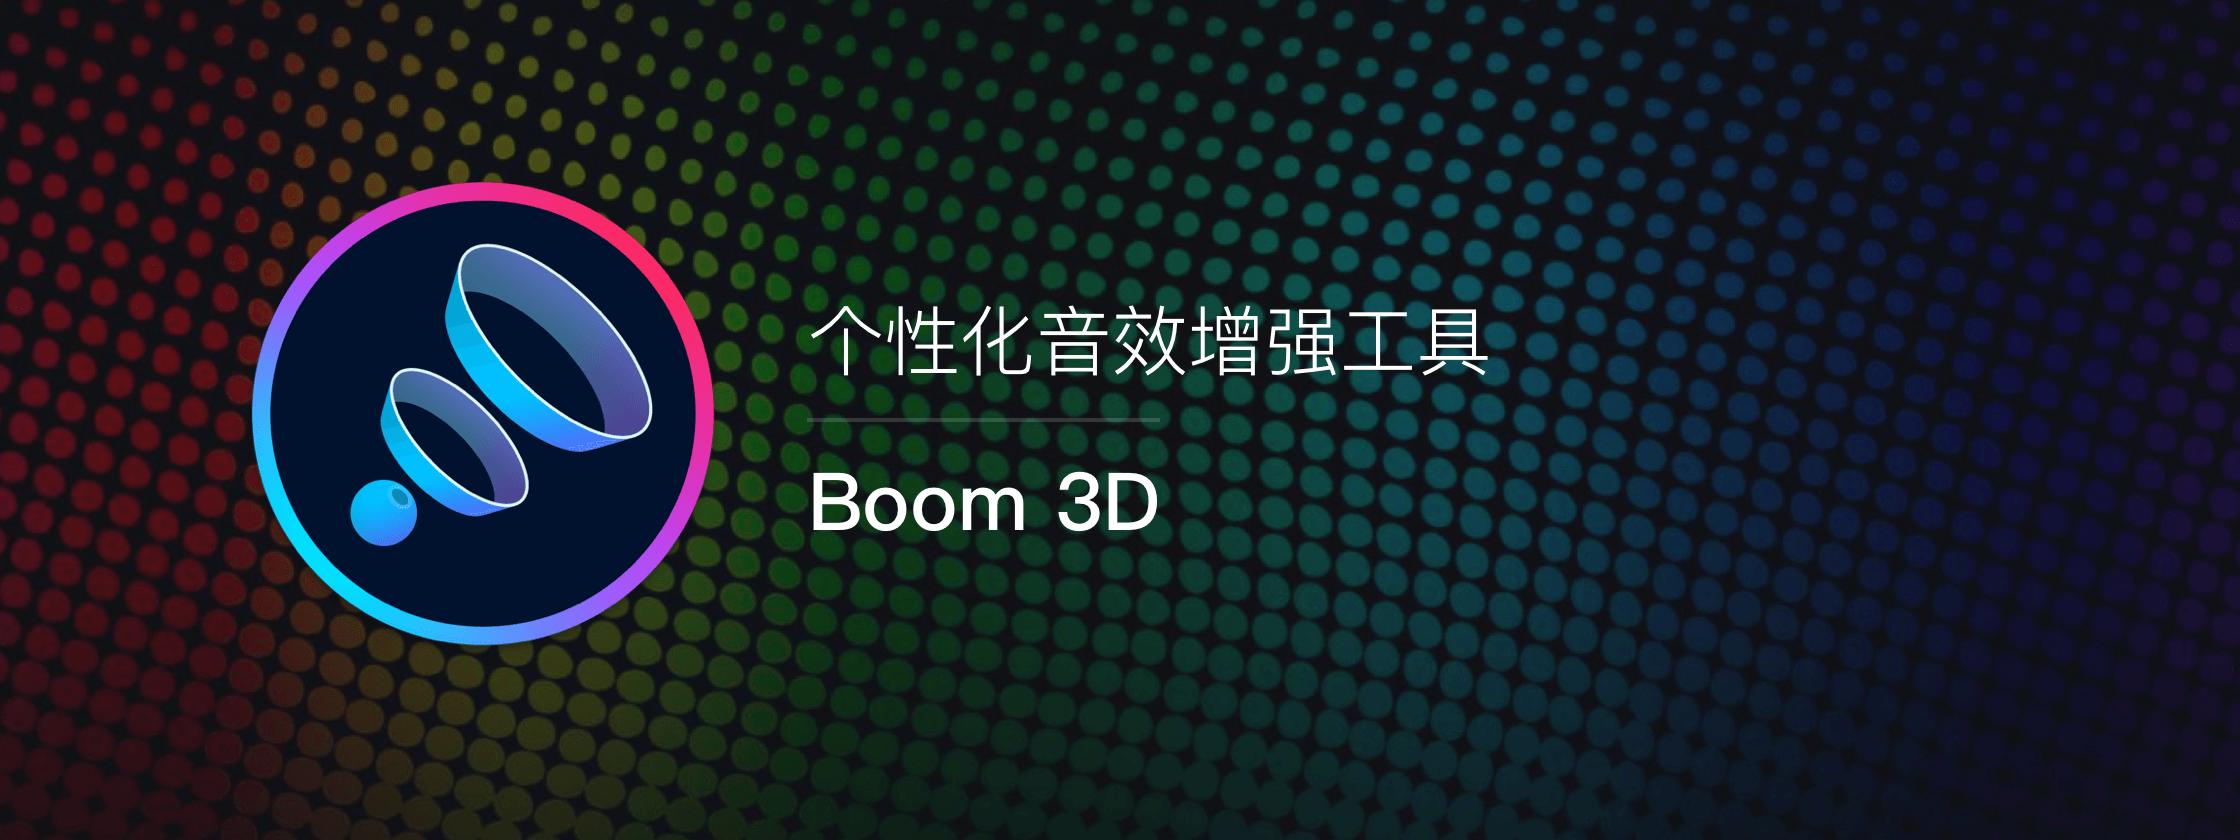 Boom 3D,为你带来全新 3D 环绕声体验